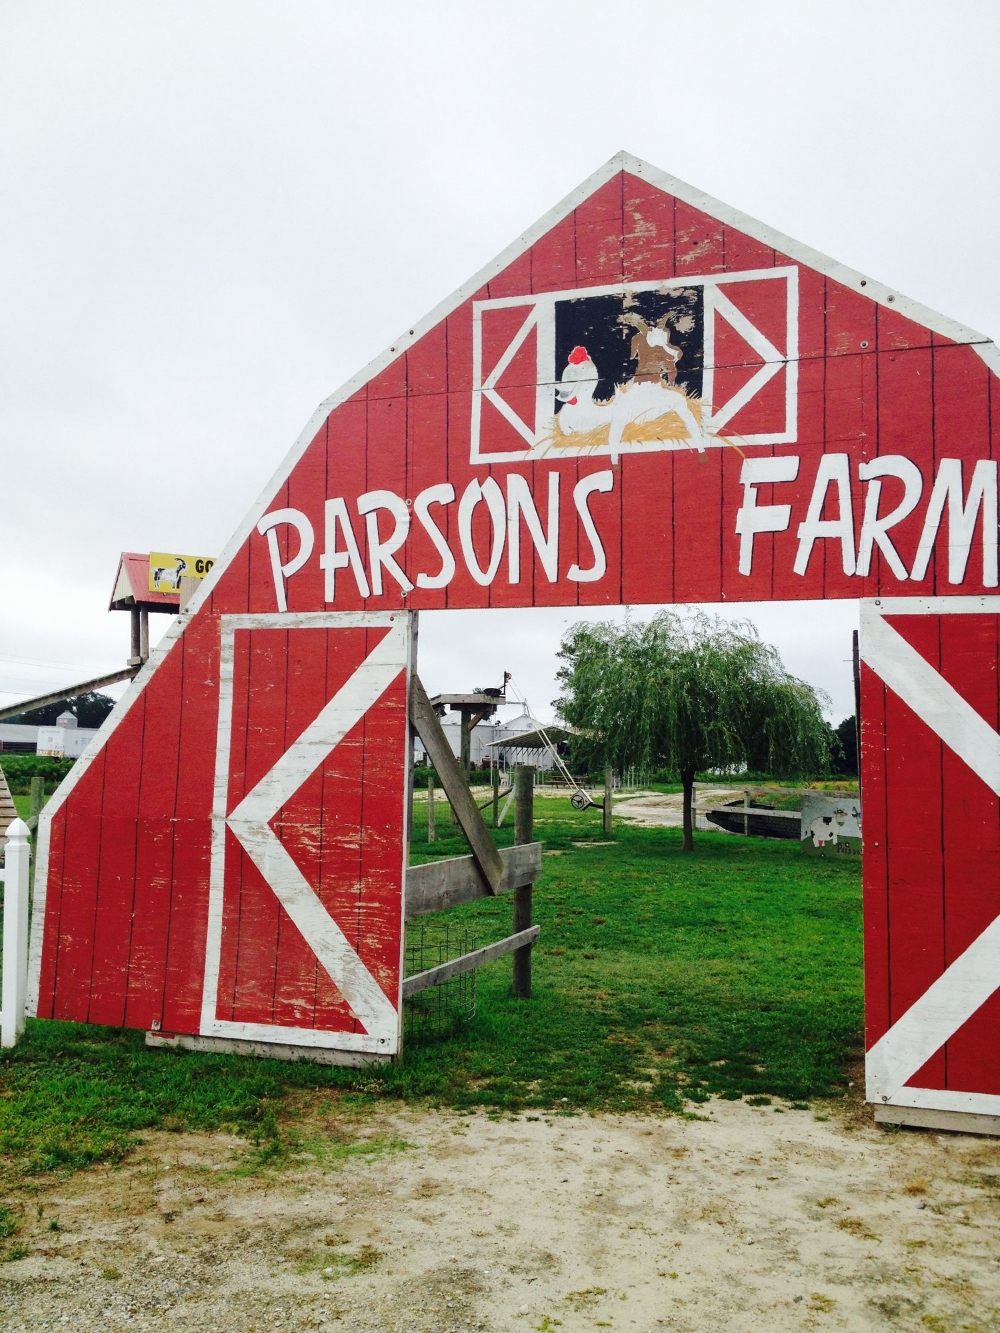 Parsons farm.jpg